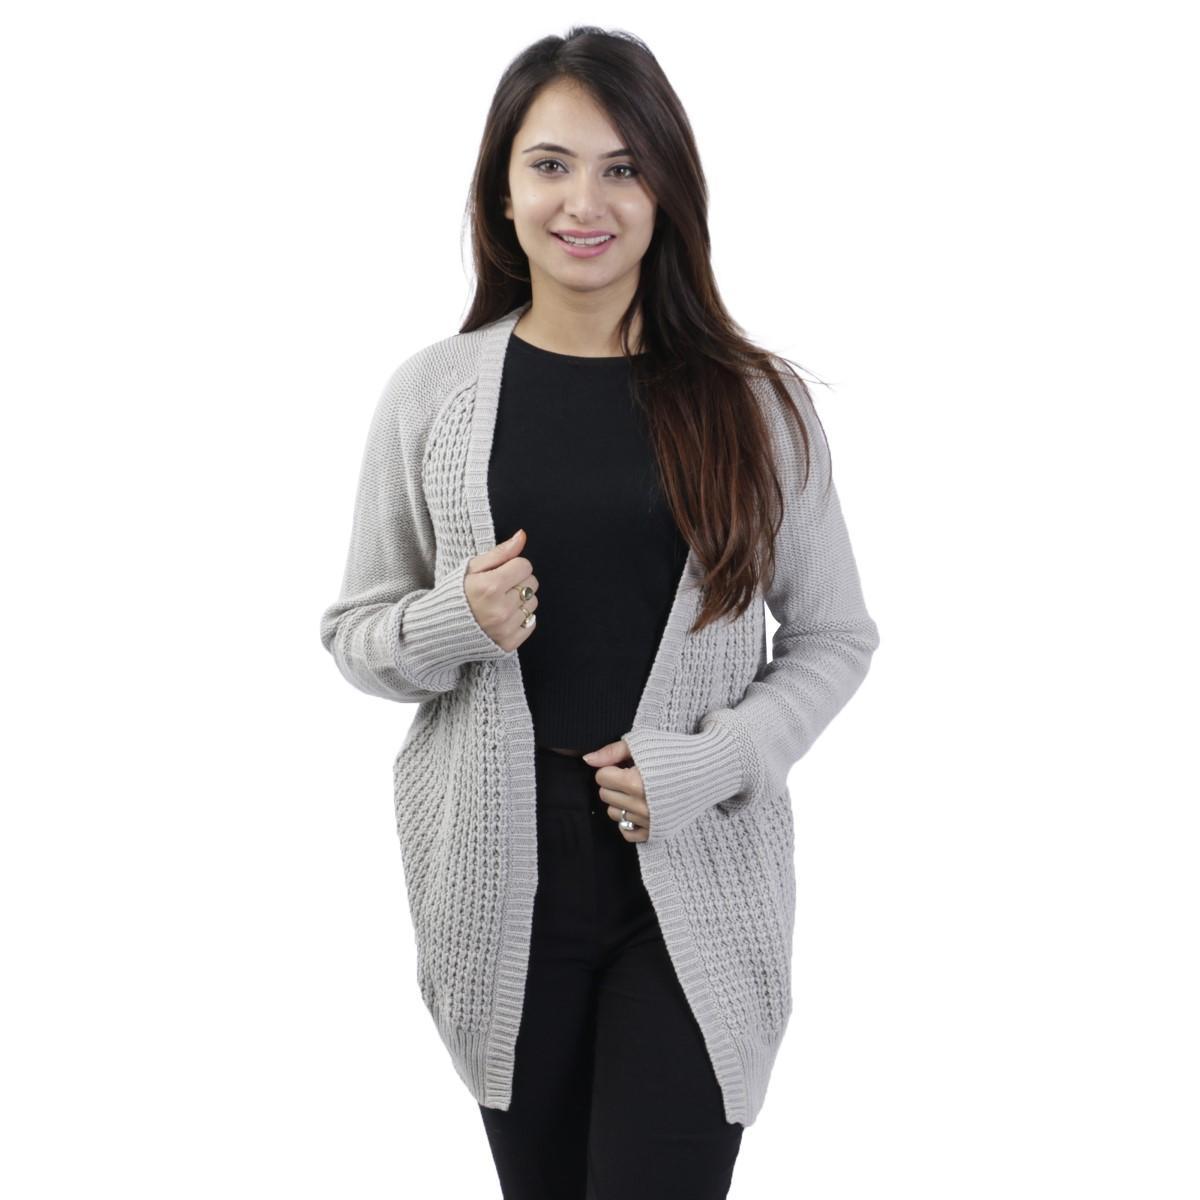 26ed4683a4991 Women s Sweaters Price in Nepal - Buy Cardigans For Women Online ...